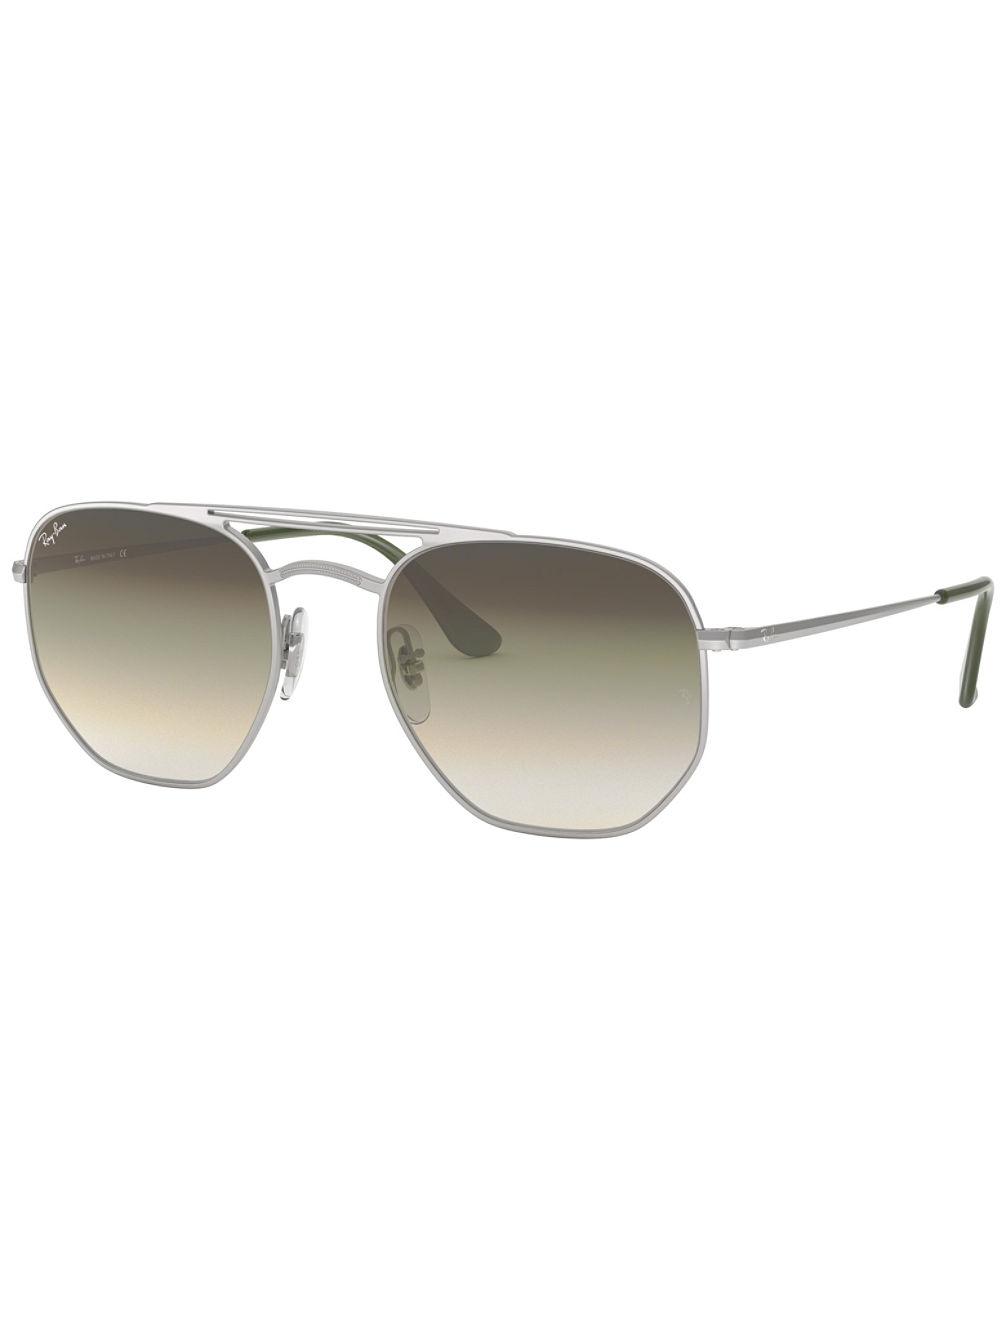 Köp Ray Ban Demi Gloss Silver Solglasögon online på blue-tomato.com 03f05ae9b8143